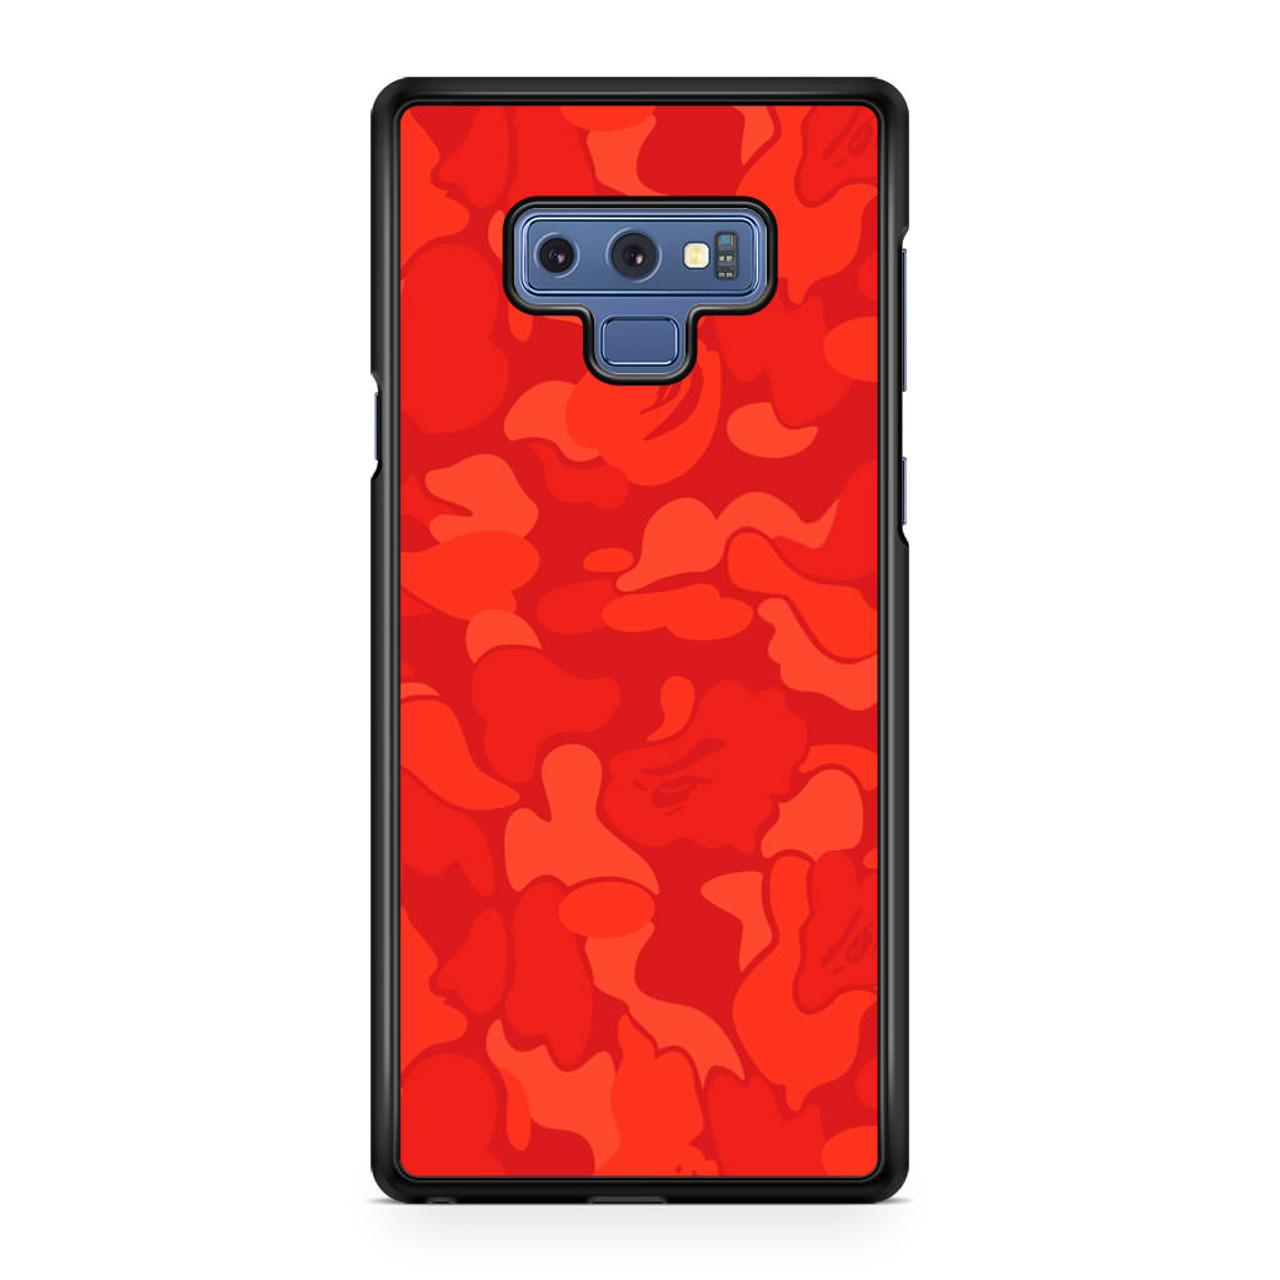 premium selection f85a8 1c530 Bape Camo Red Samsung Galaxy Note 9 Case